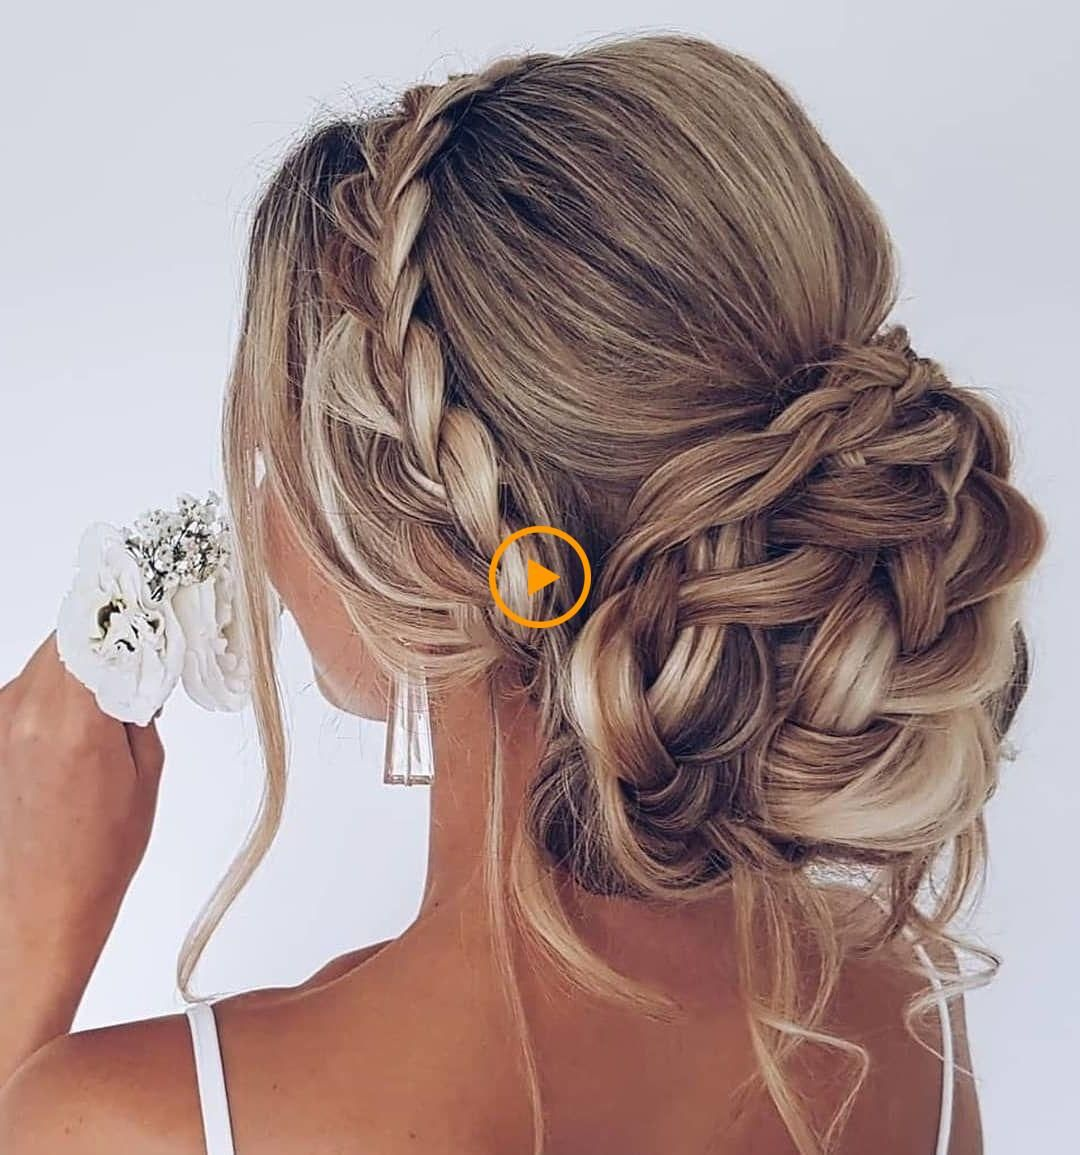 25 Updo Wedding Hairstyles for Long Hair weddingdresses